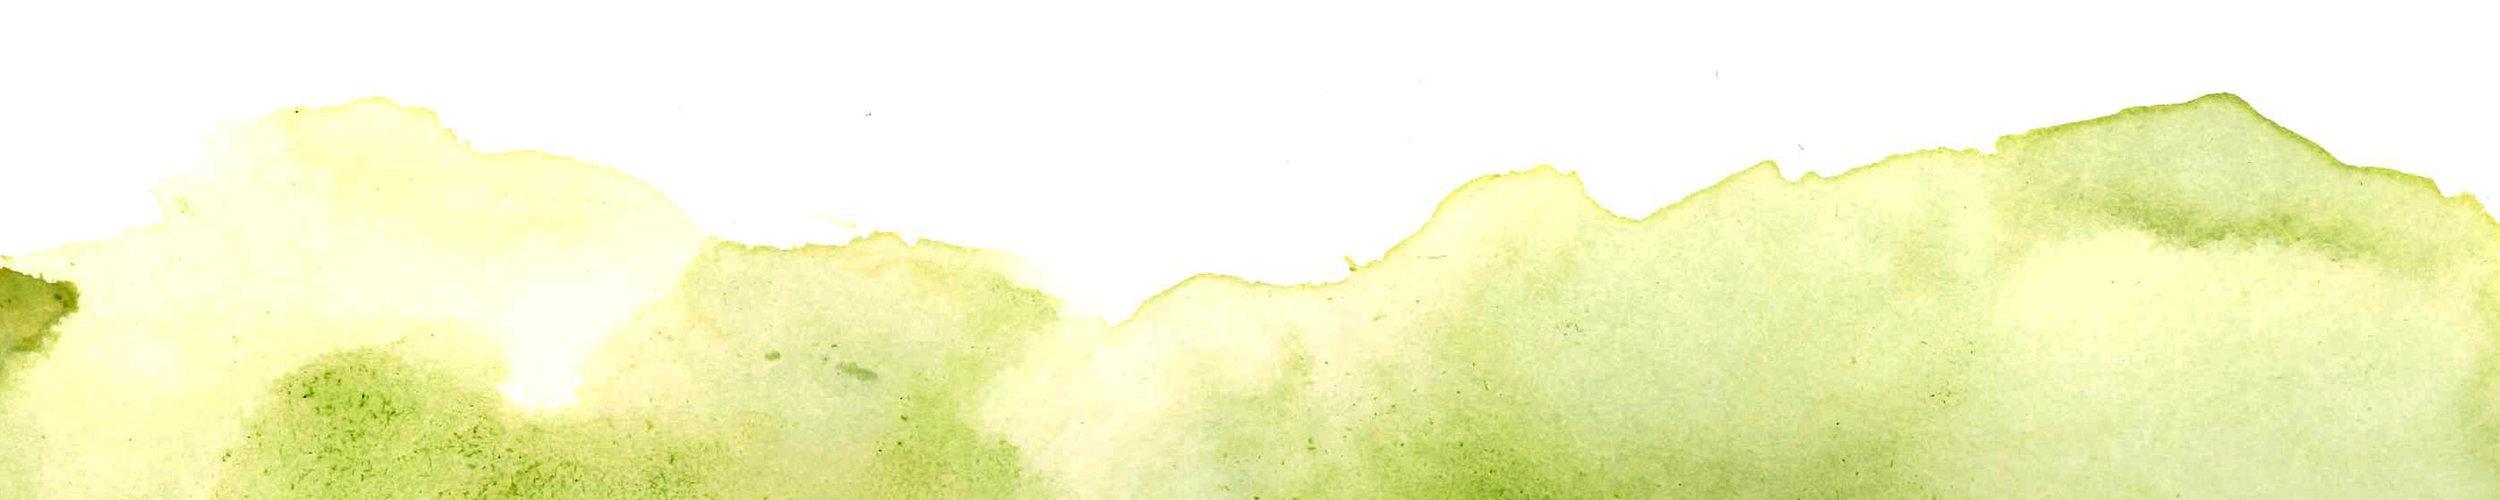 watercolor_pagebottom.jpg